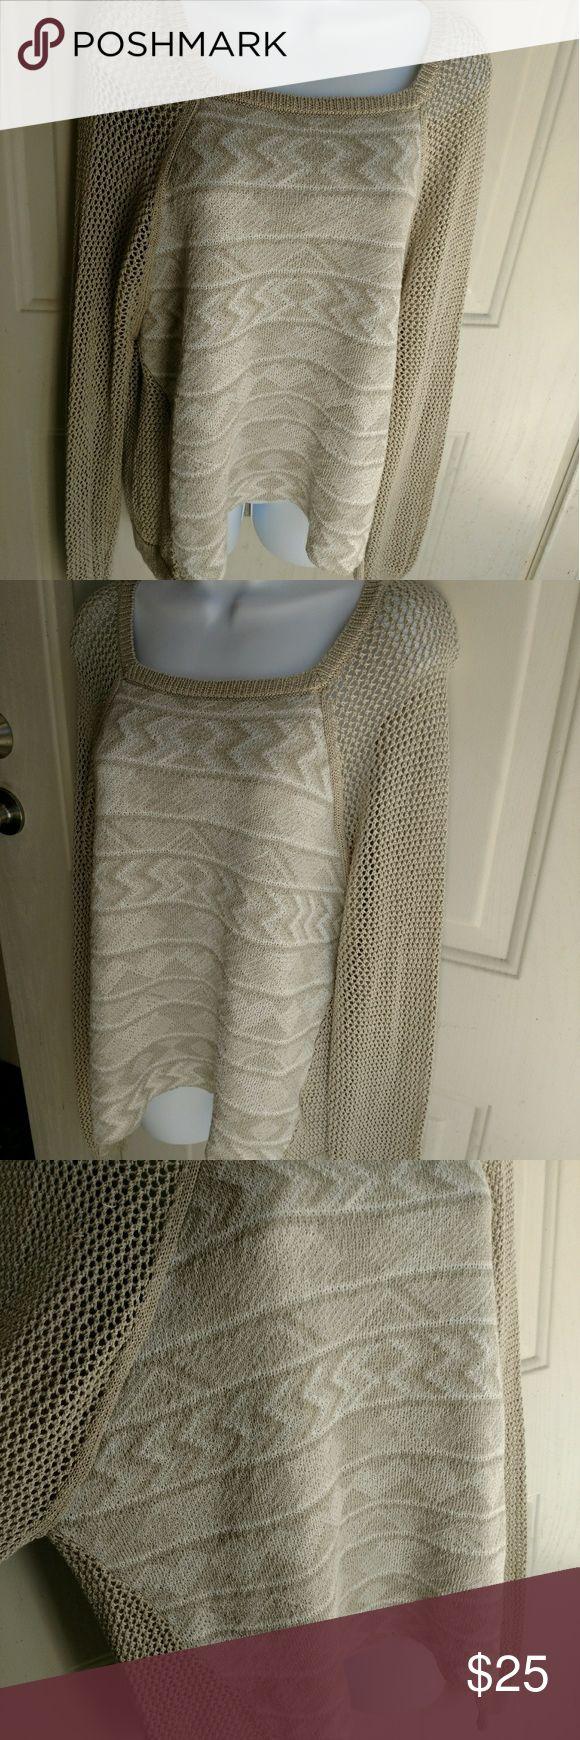 Rachel Rachel Roy tan tribal print sweater Rachel Rachel Roy tan cream tribal print long sleeve sweater. Fish net sleeves. Size XL. Gently used with no flaws.  B7-116 RACHEL Rachel Roy Sweaters Crew & Scoop Necks